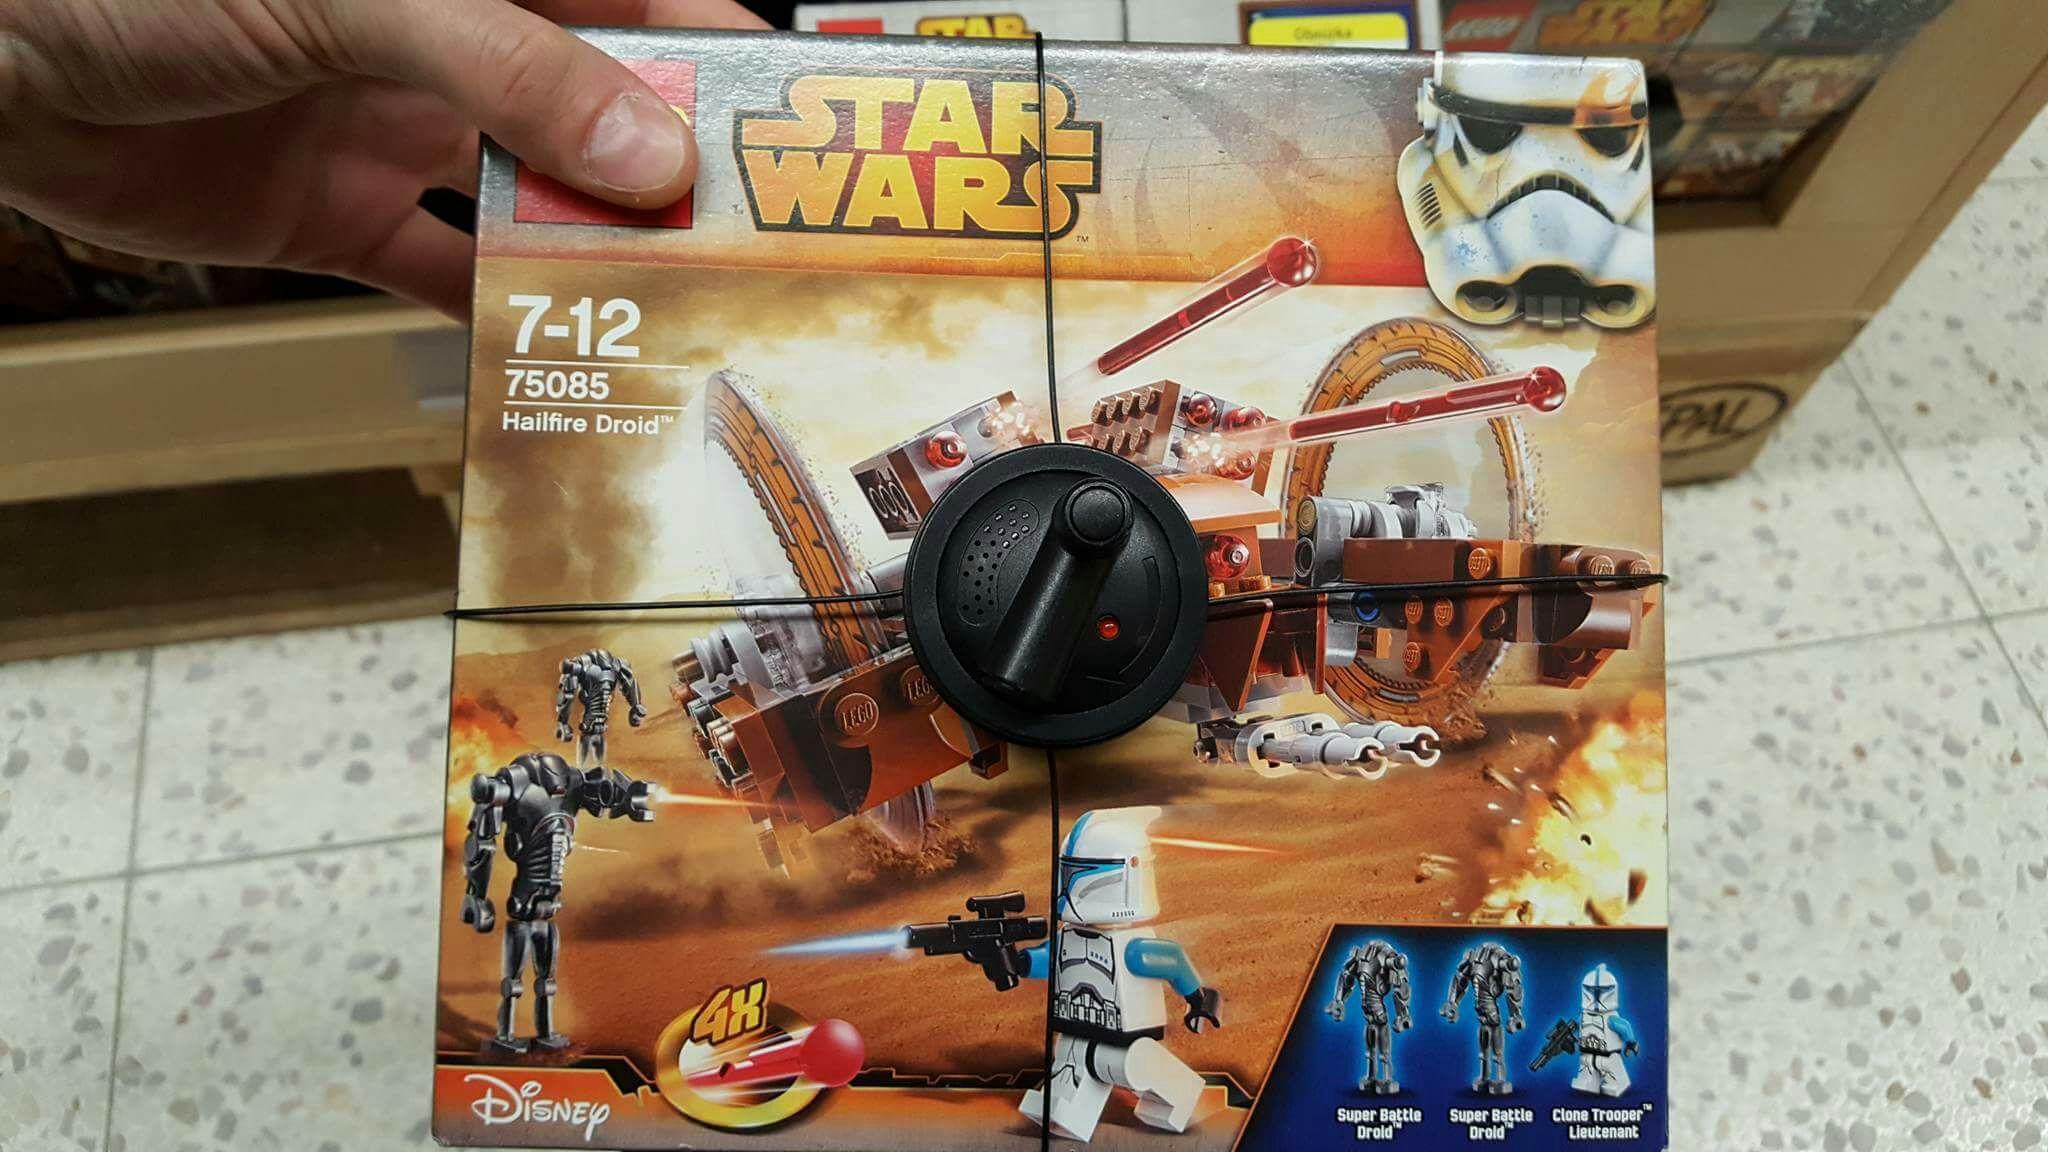 Lego Star Wars Hailfire Droid 75085 @Tesco Galeria Łódzka